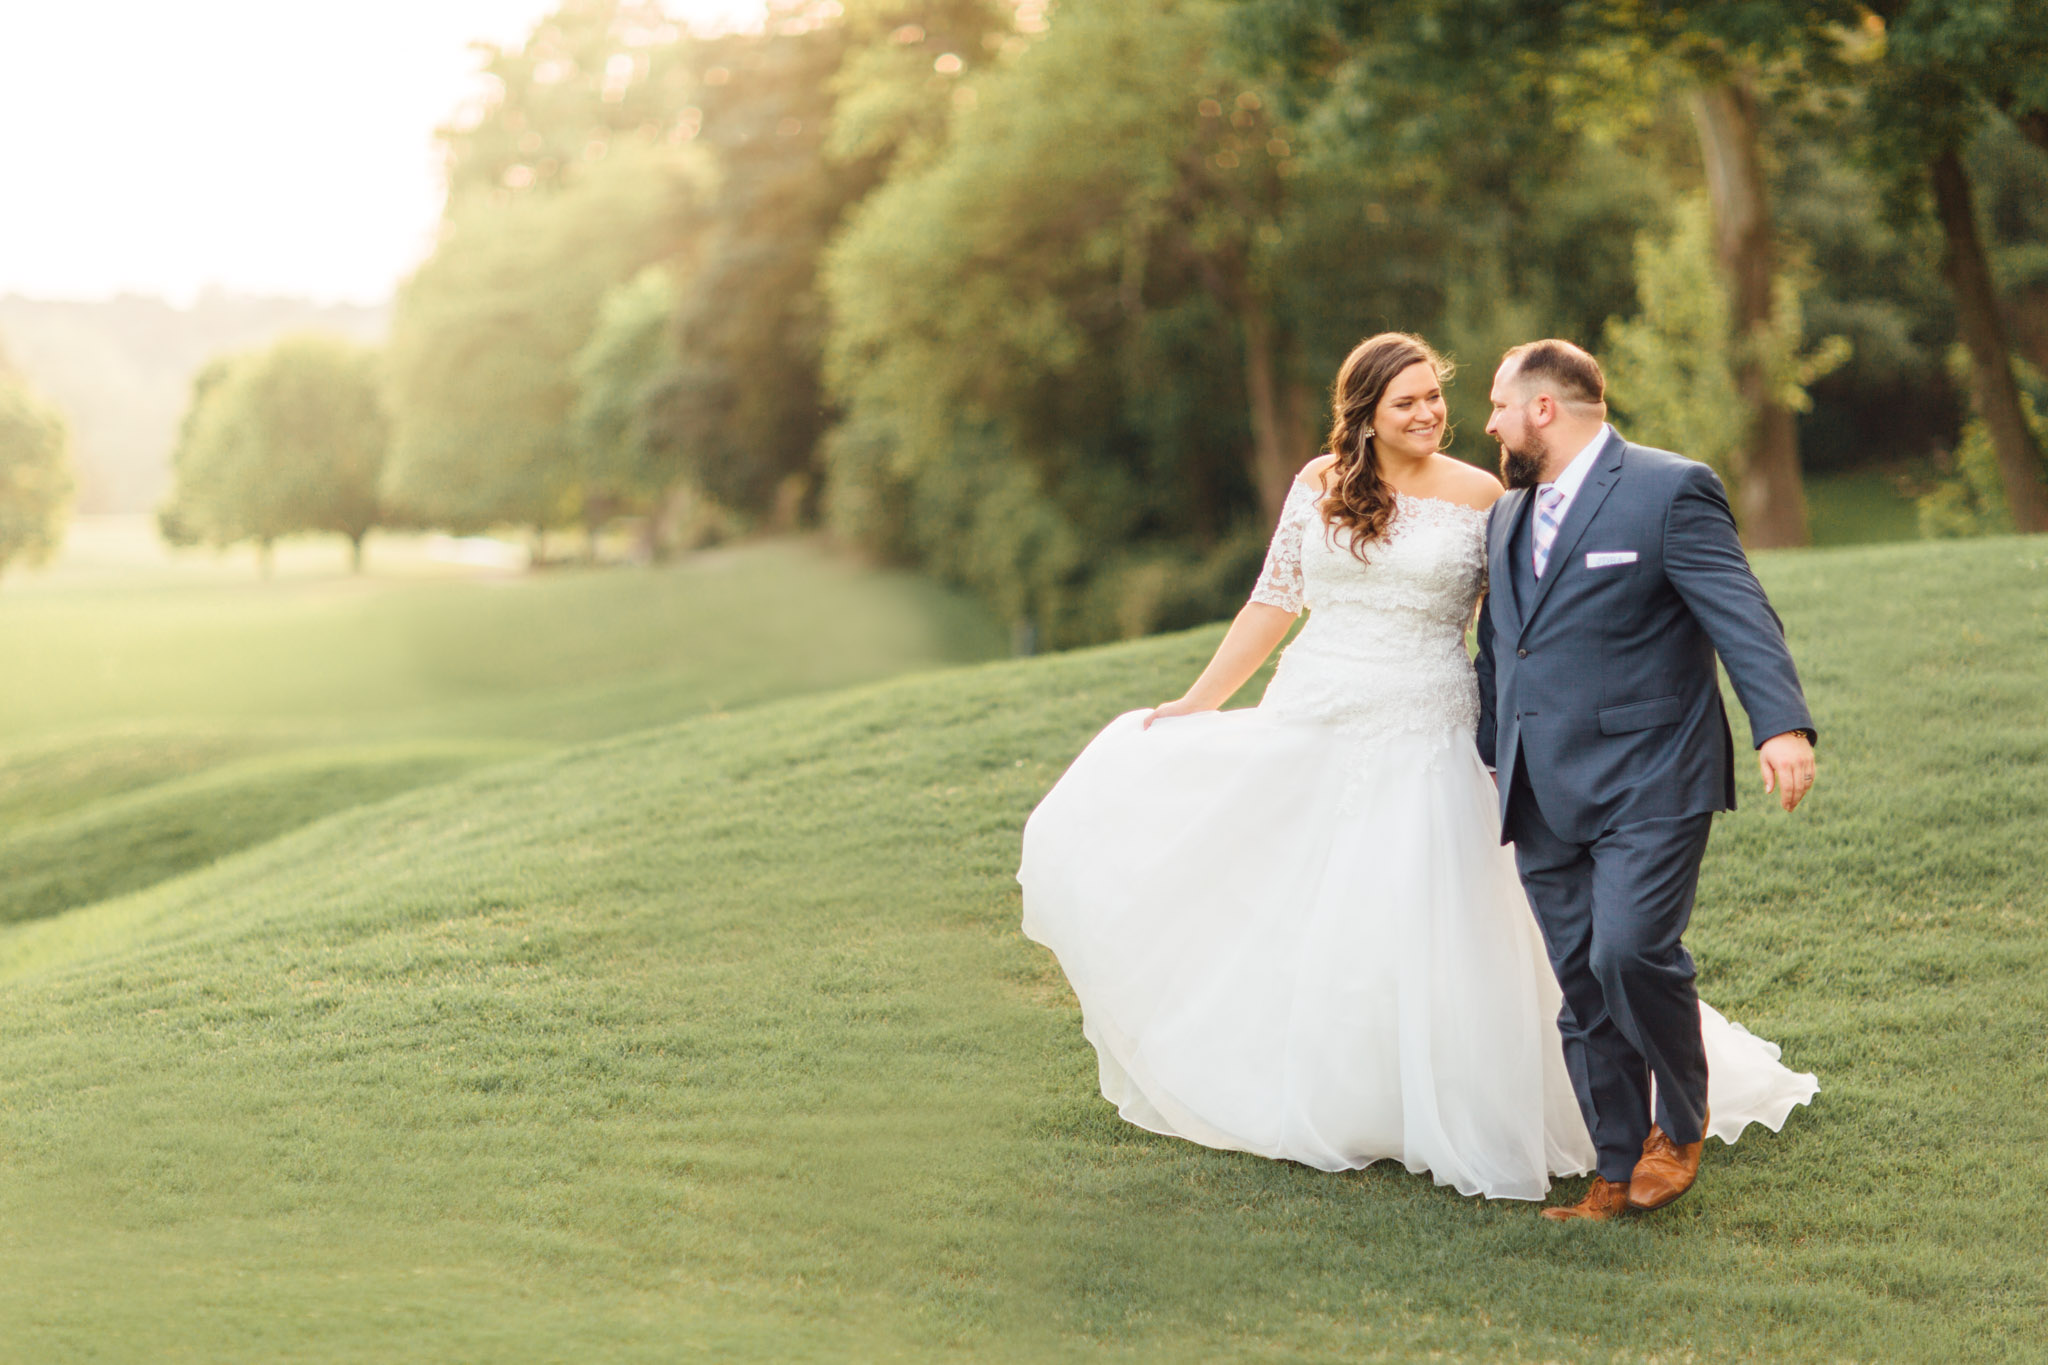 Country Club of Virginia Wedding Photographer_0102.jpg